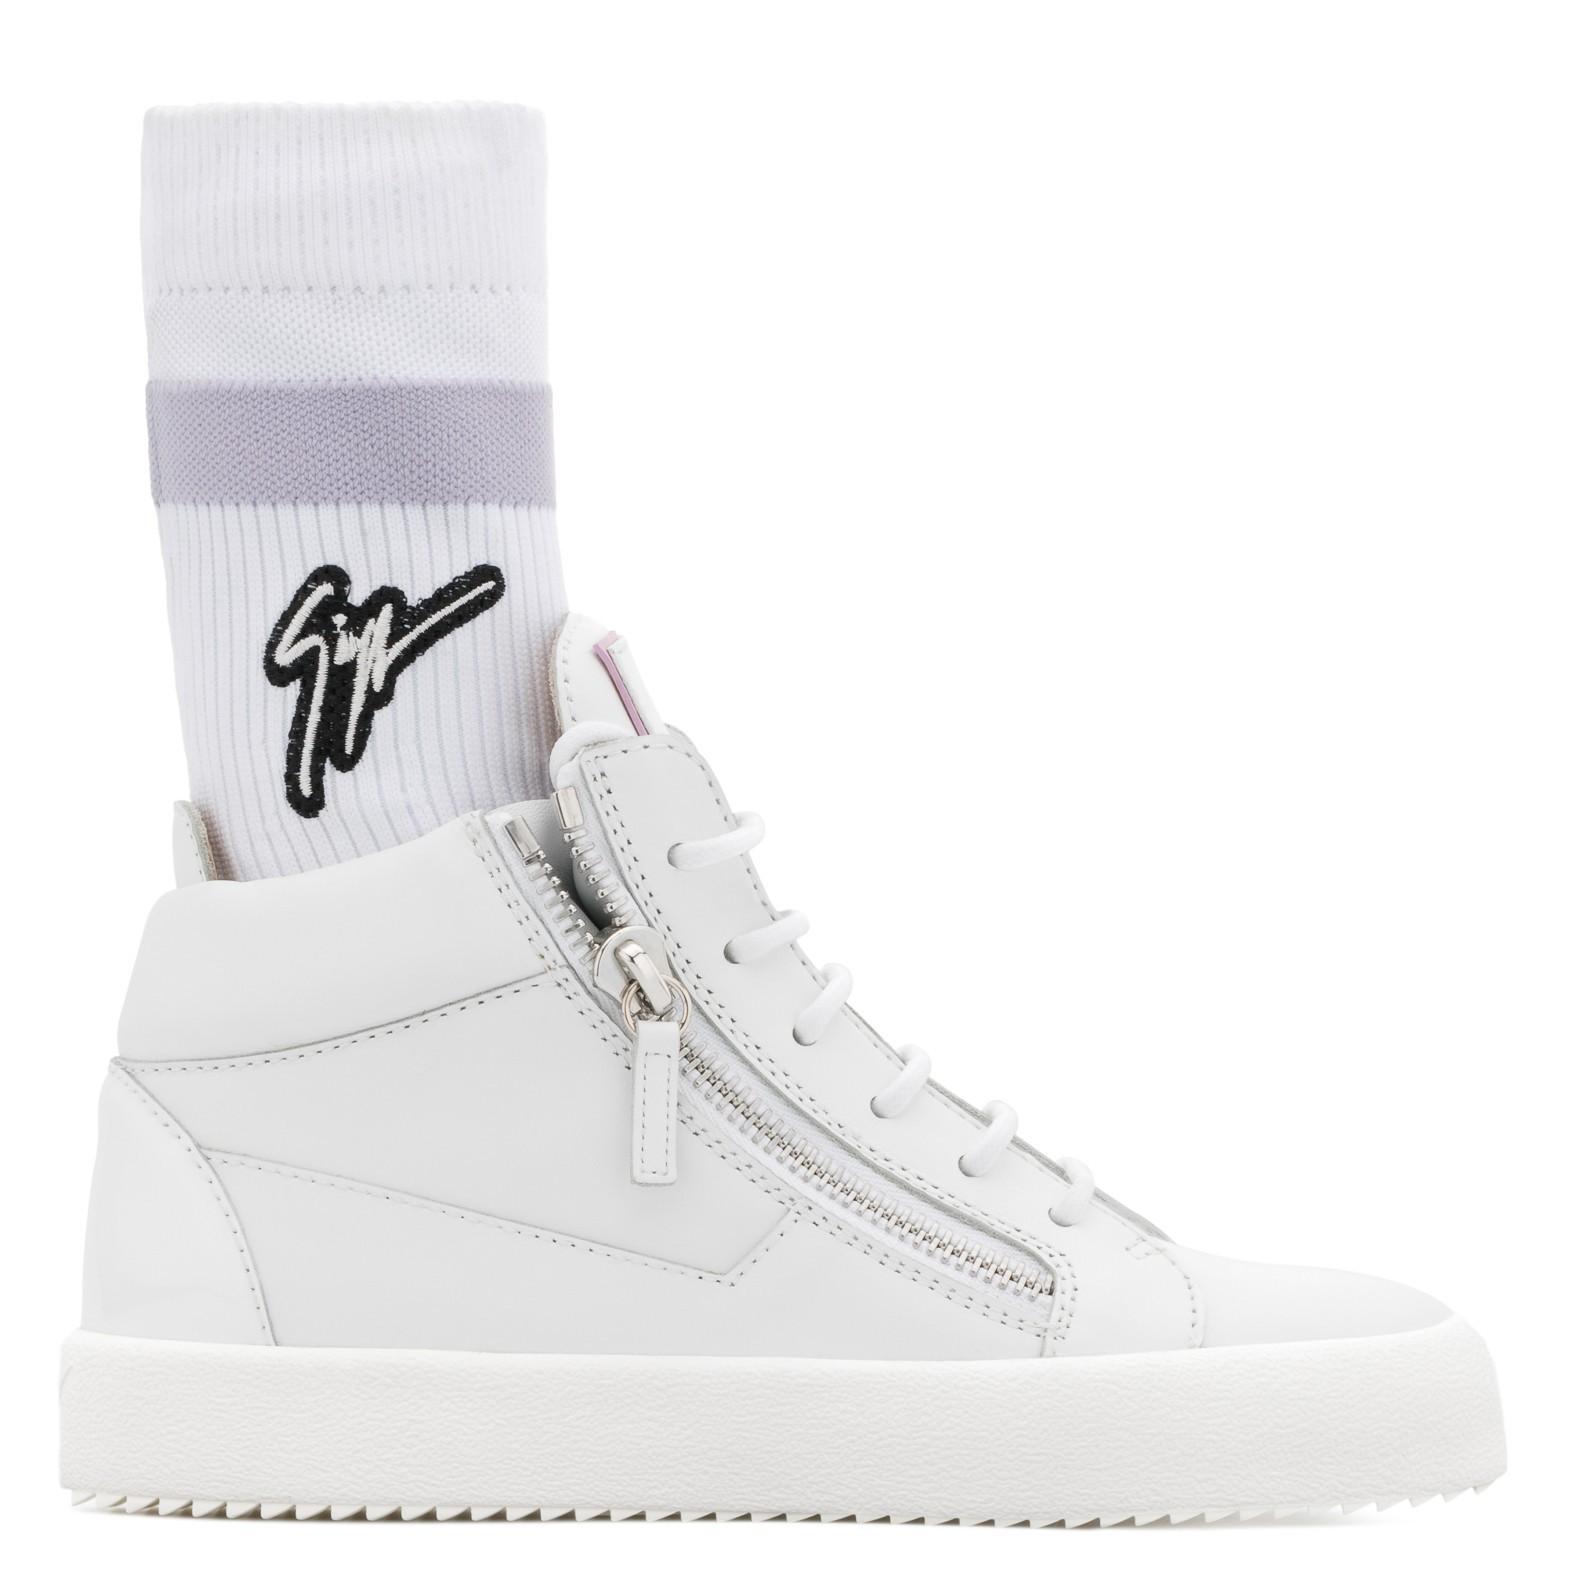 852eb097aa9e5 Giuseppe Zanotti White Leather mid-top sneaker with white and purple  'Signature' sock | ShoeSales